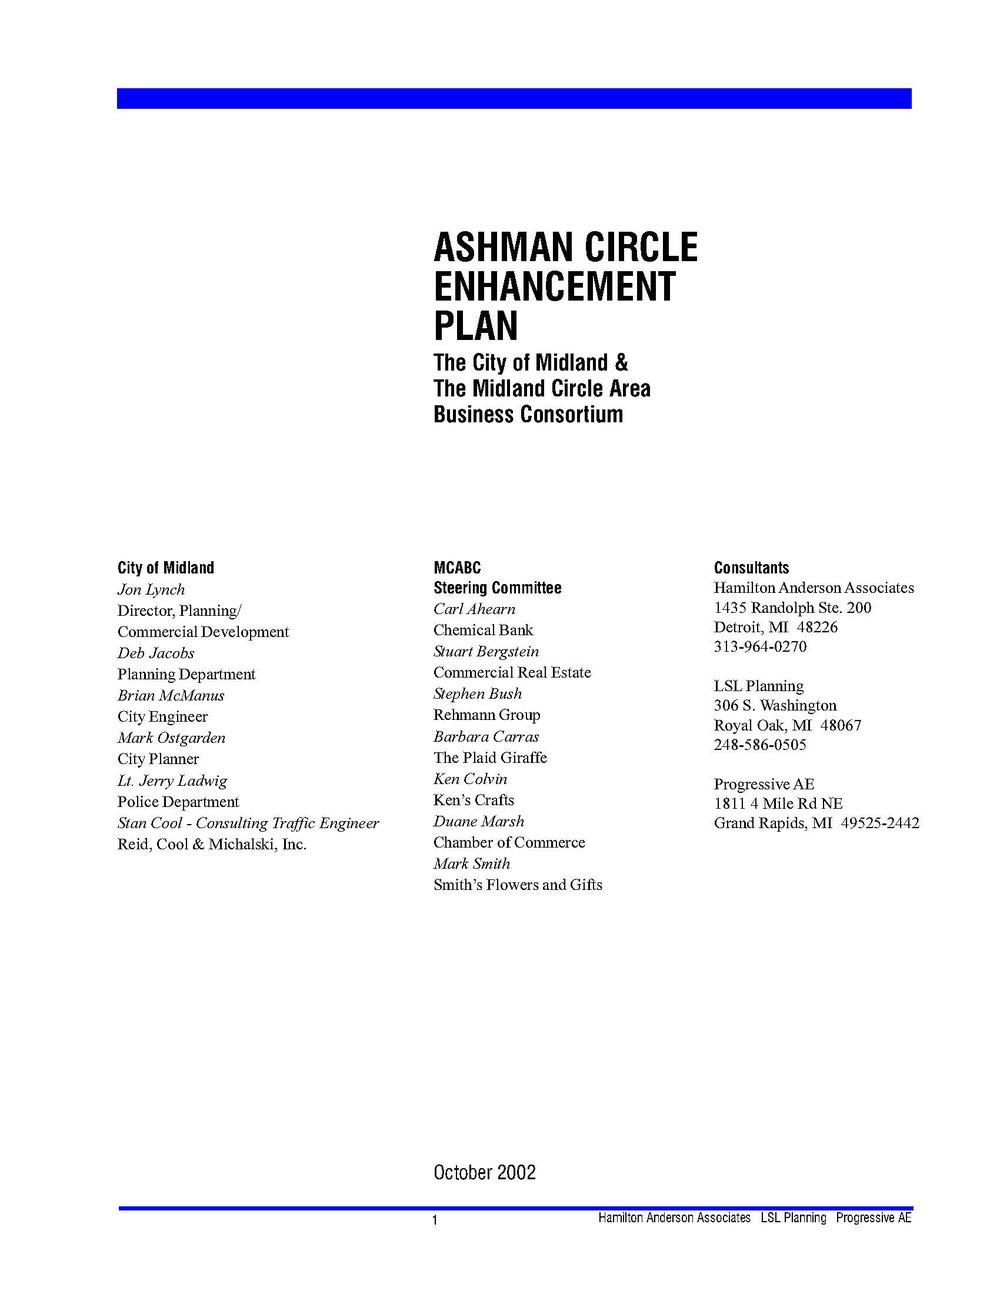 Ashman Circle Enhancement Plan_Page_03.jpg